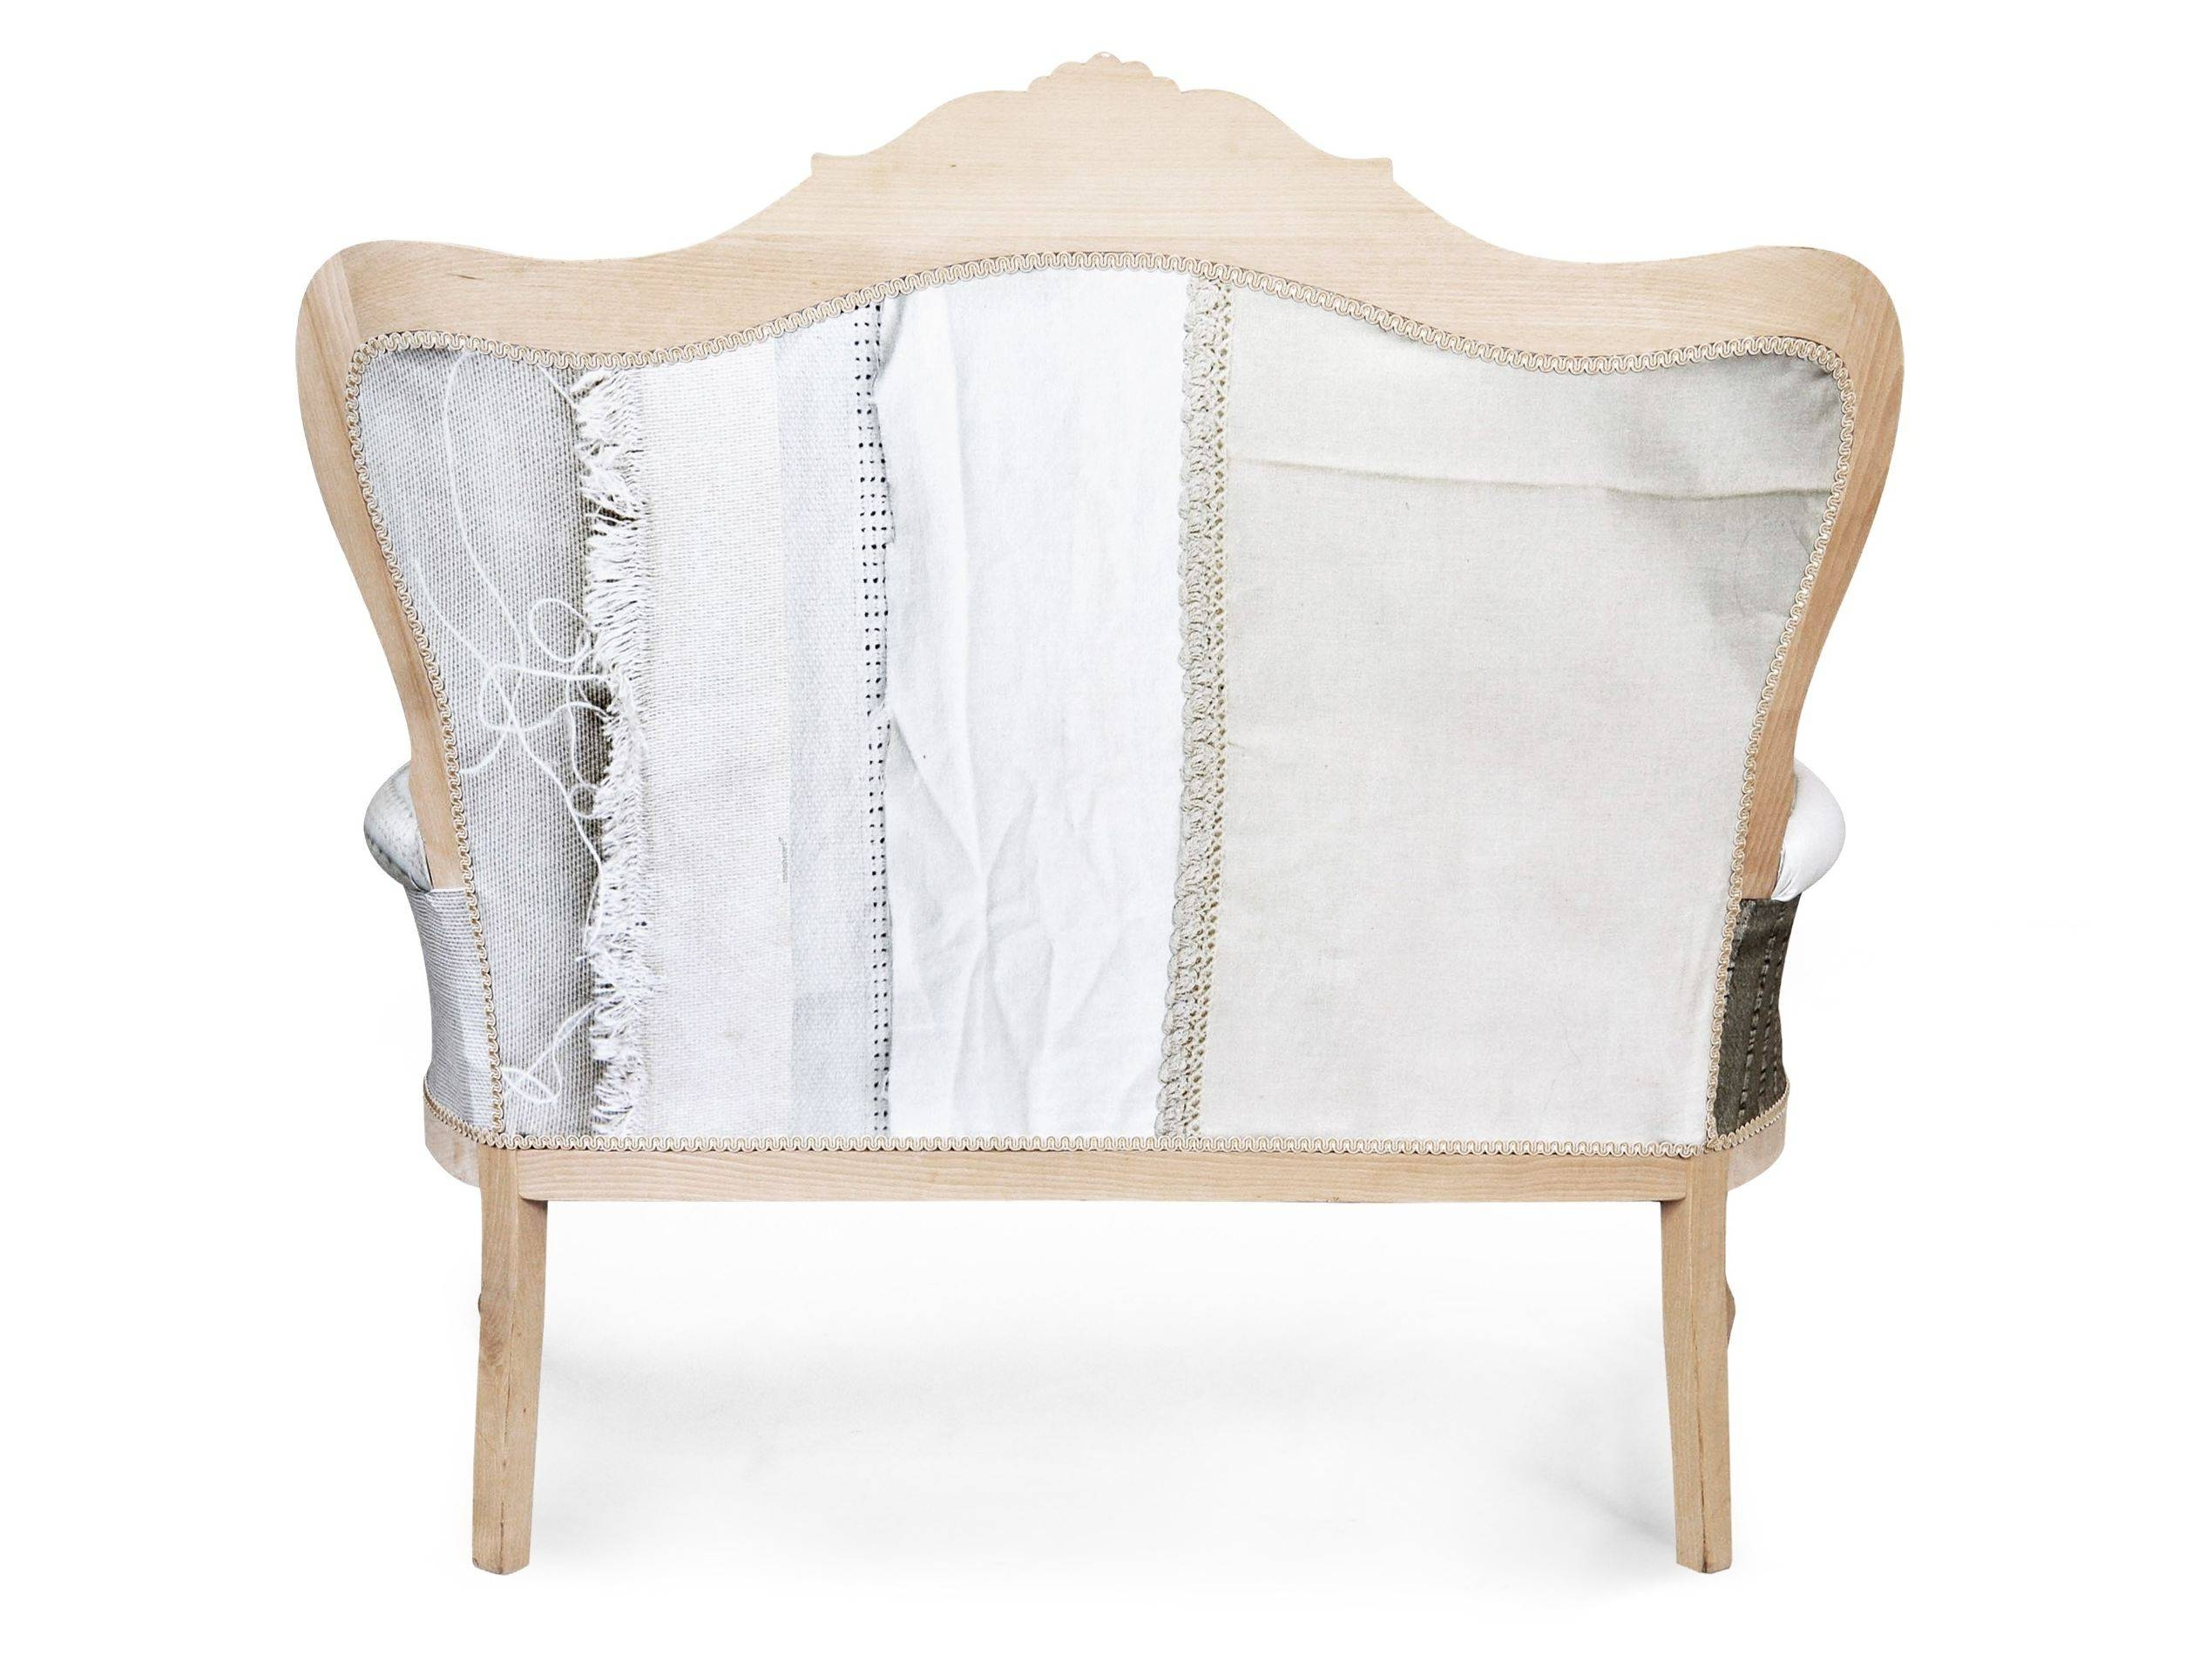 Sofas Center : Shabby Chicfa Helpformycredit Com Classy On Home inside Shabby Chic Sofas Cheap (Image 30 of 30)